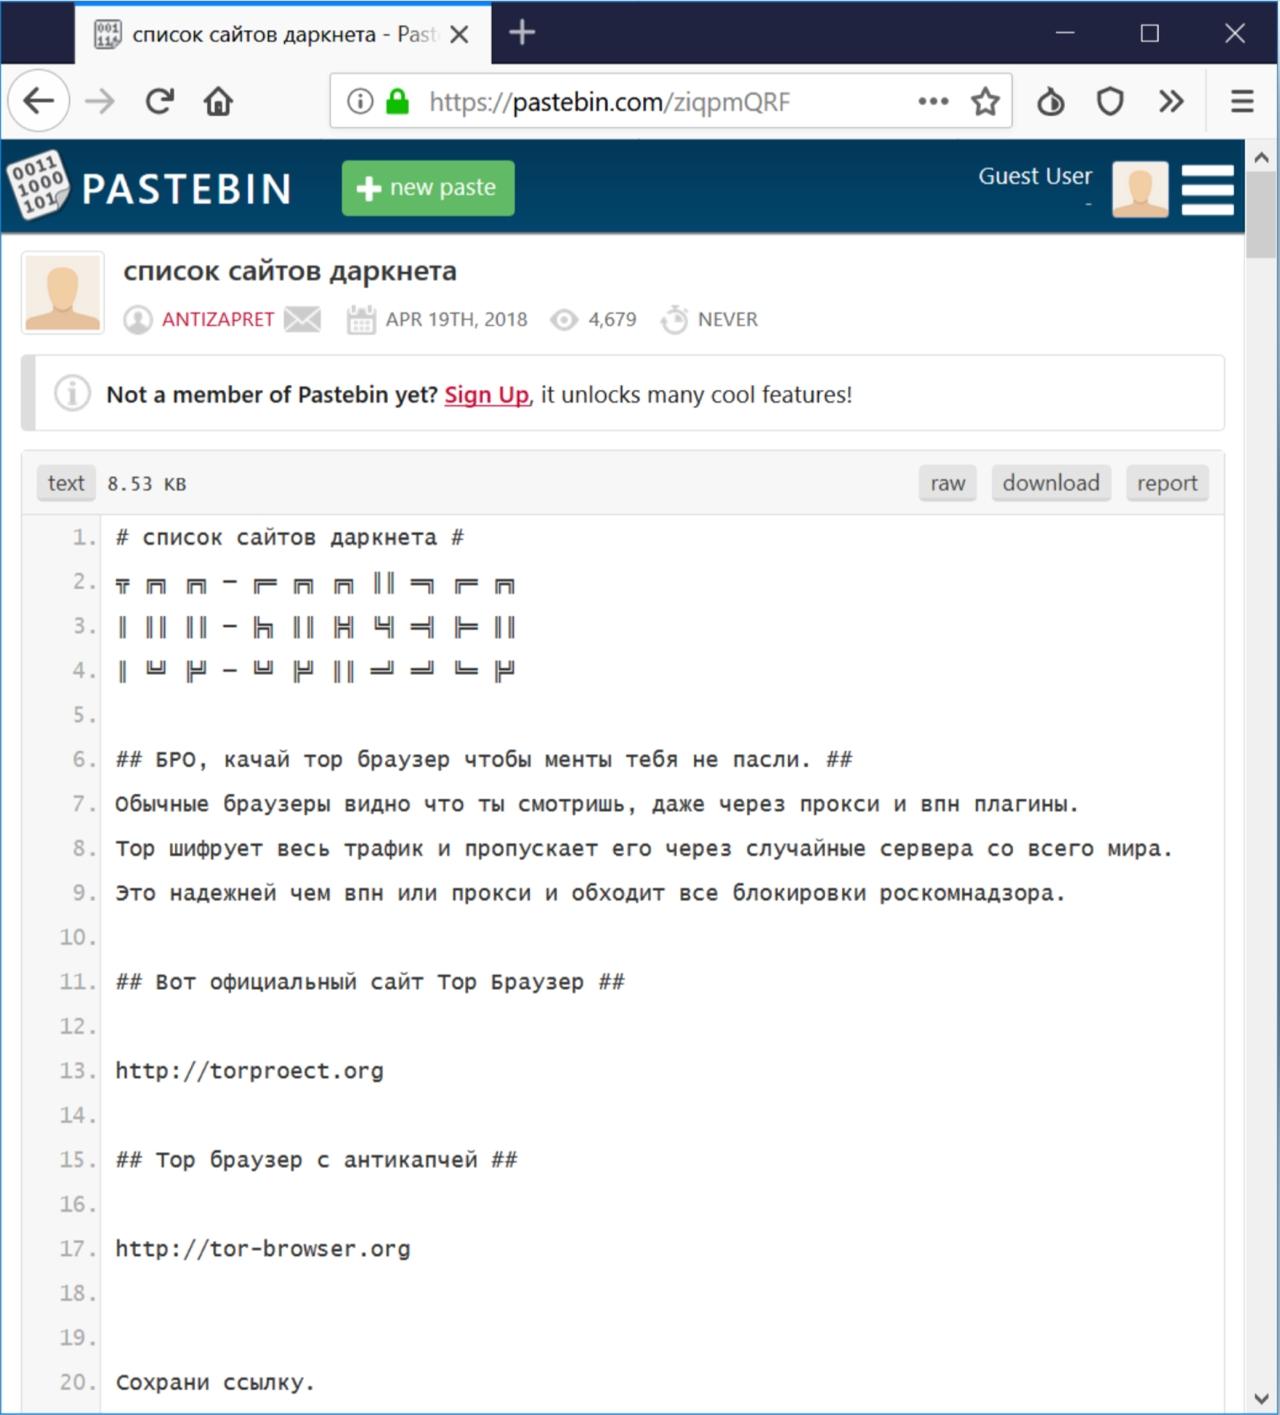 Каталог сайтов даркнет tor browser signature verification failed ubuntu hydra2web